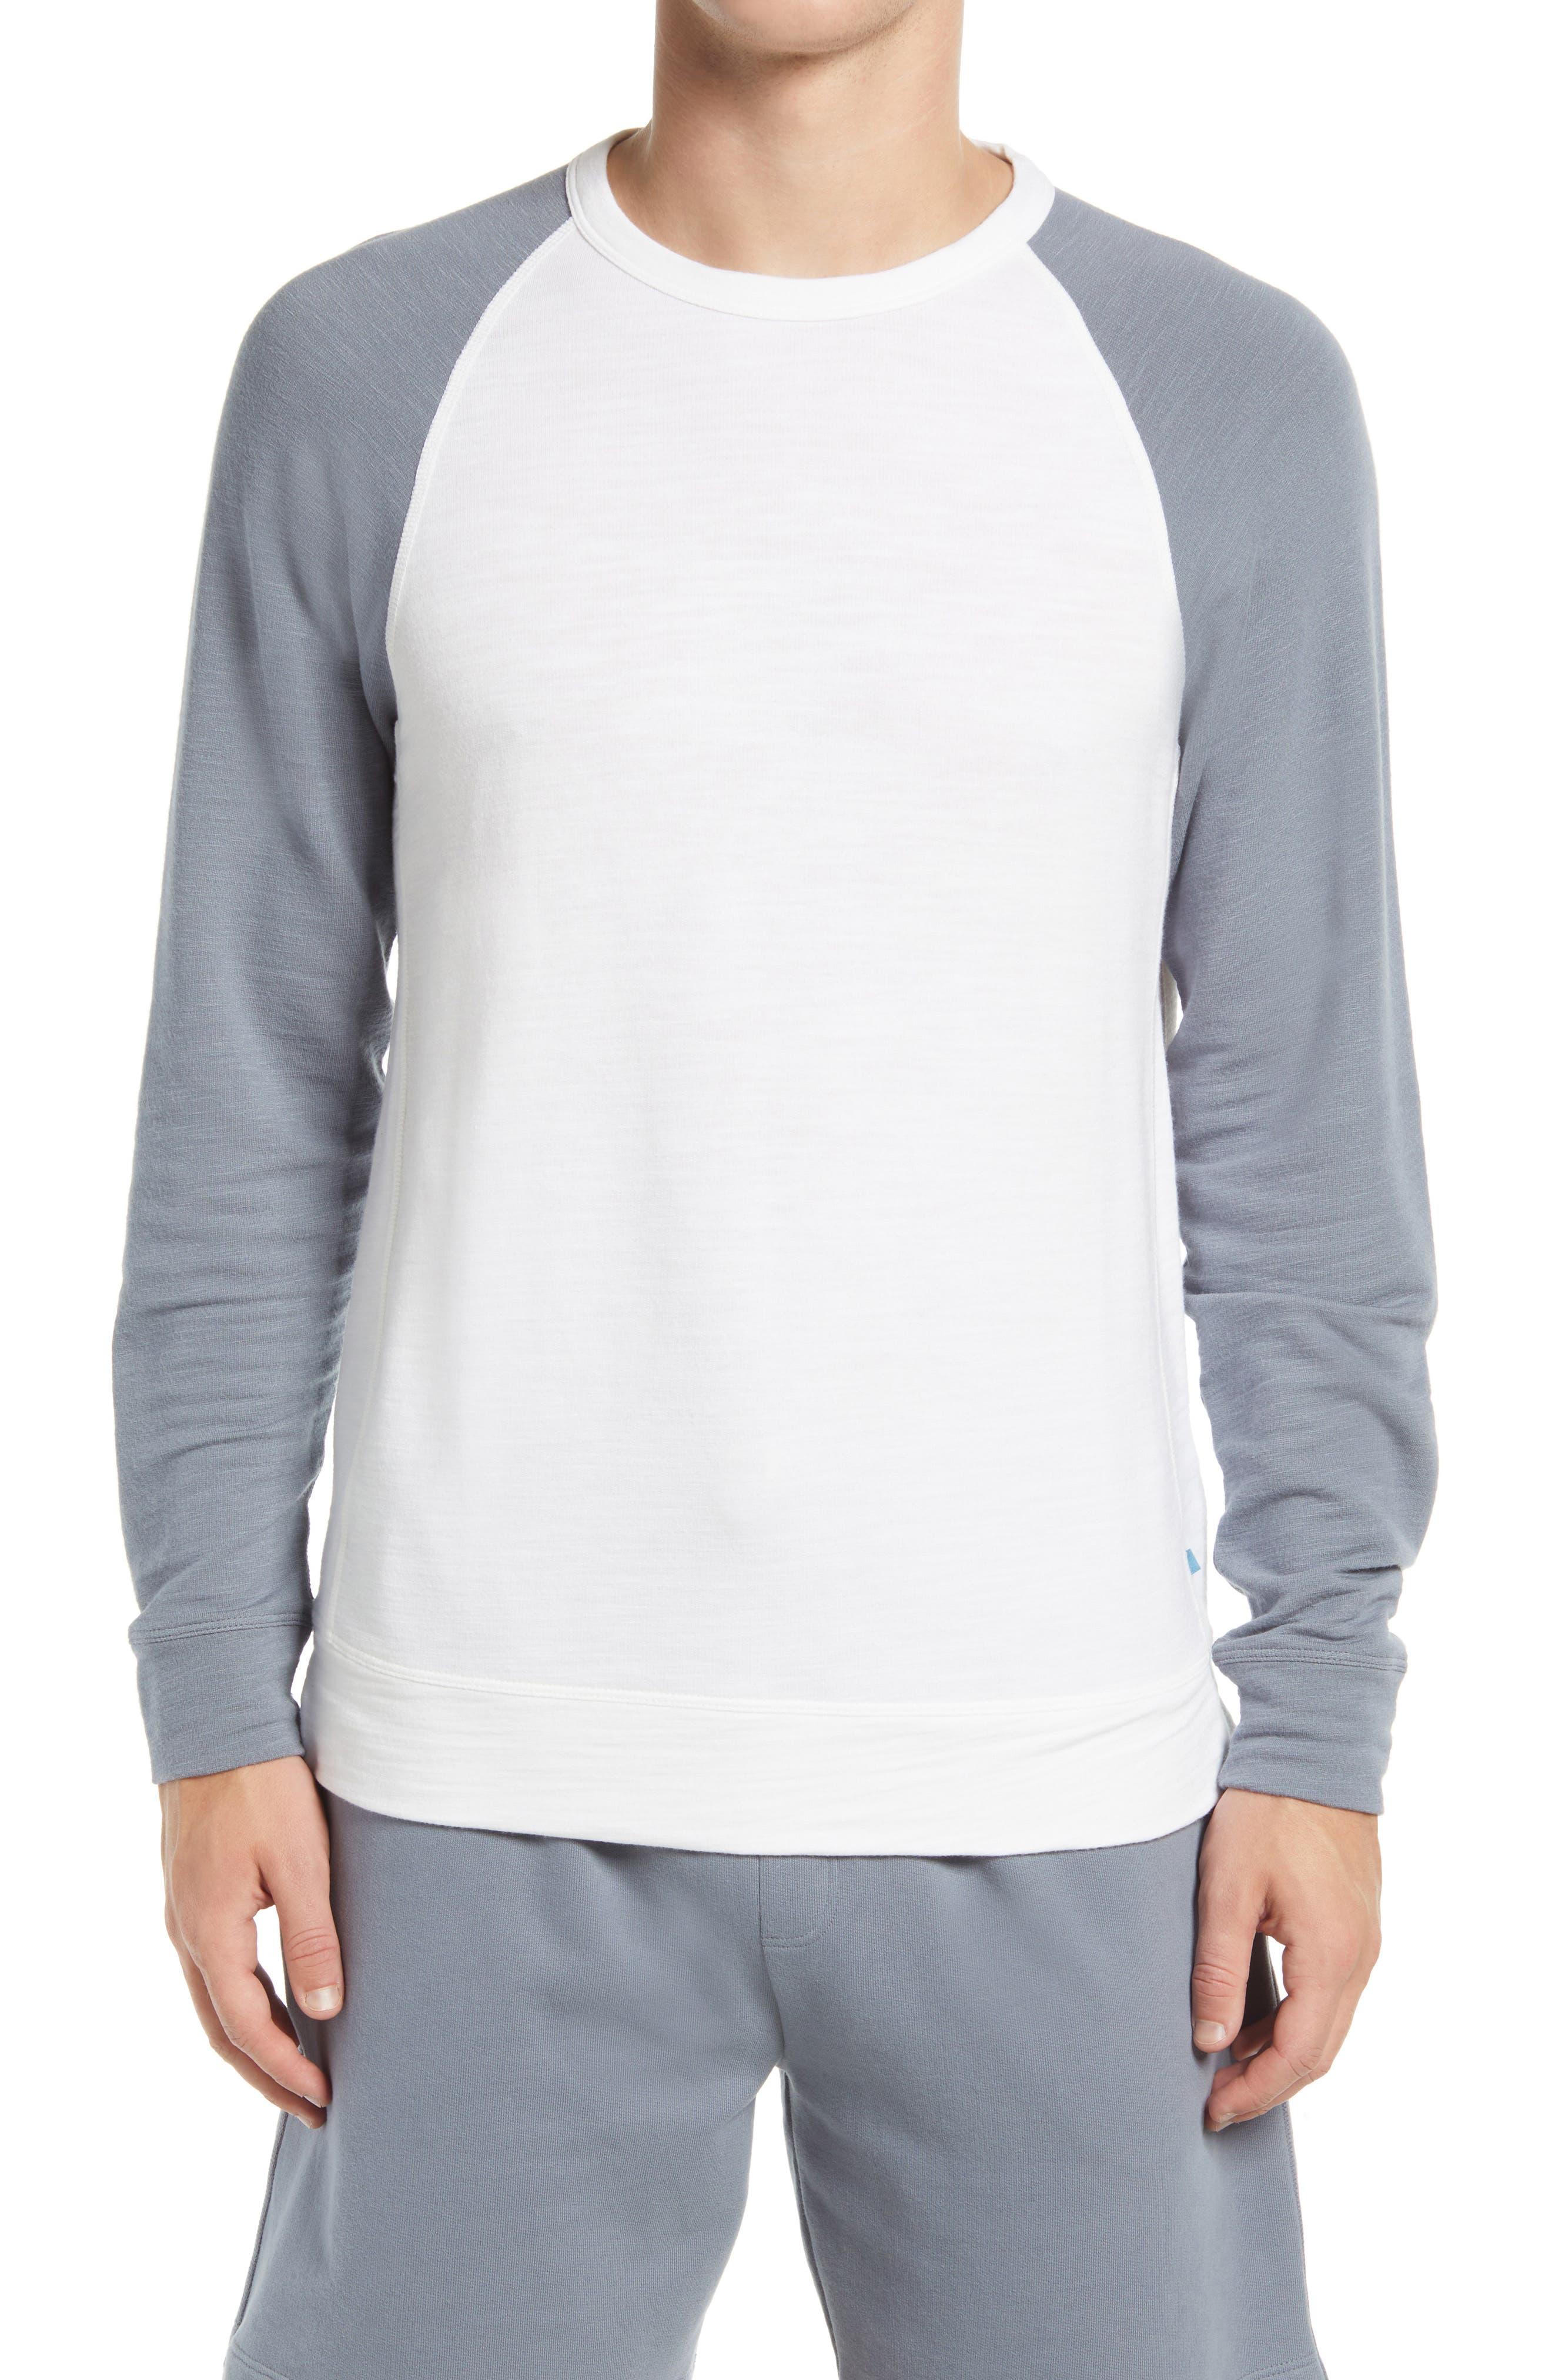 Jason Scott Raglan Sleeve T-Shirt